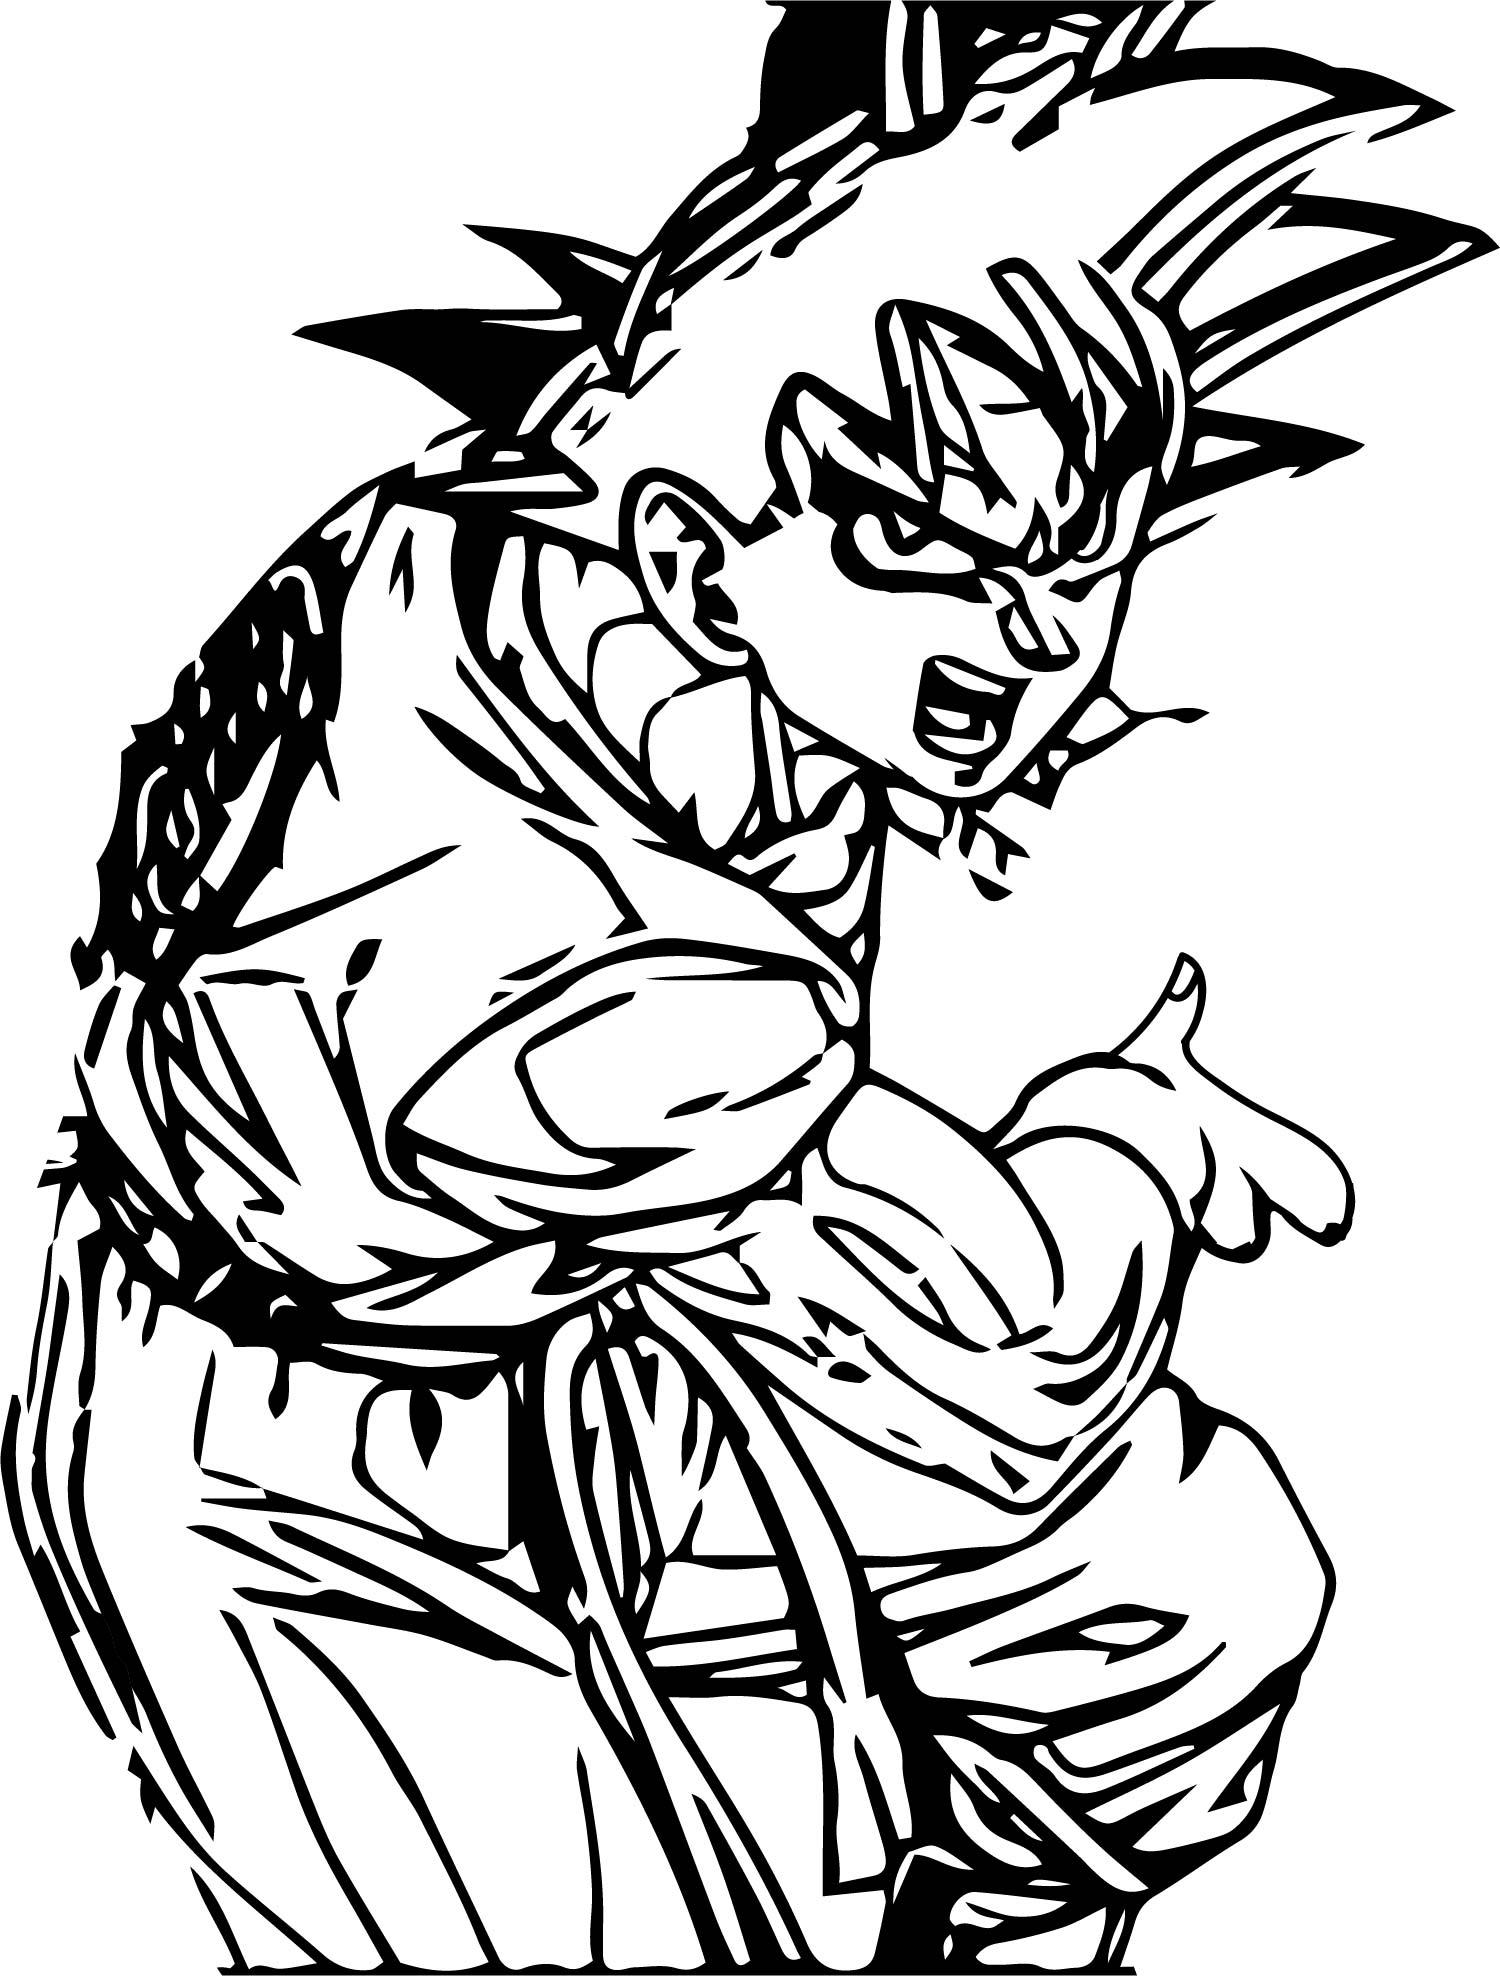 Goku We Coloring Page 045